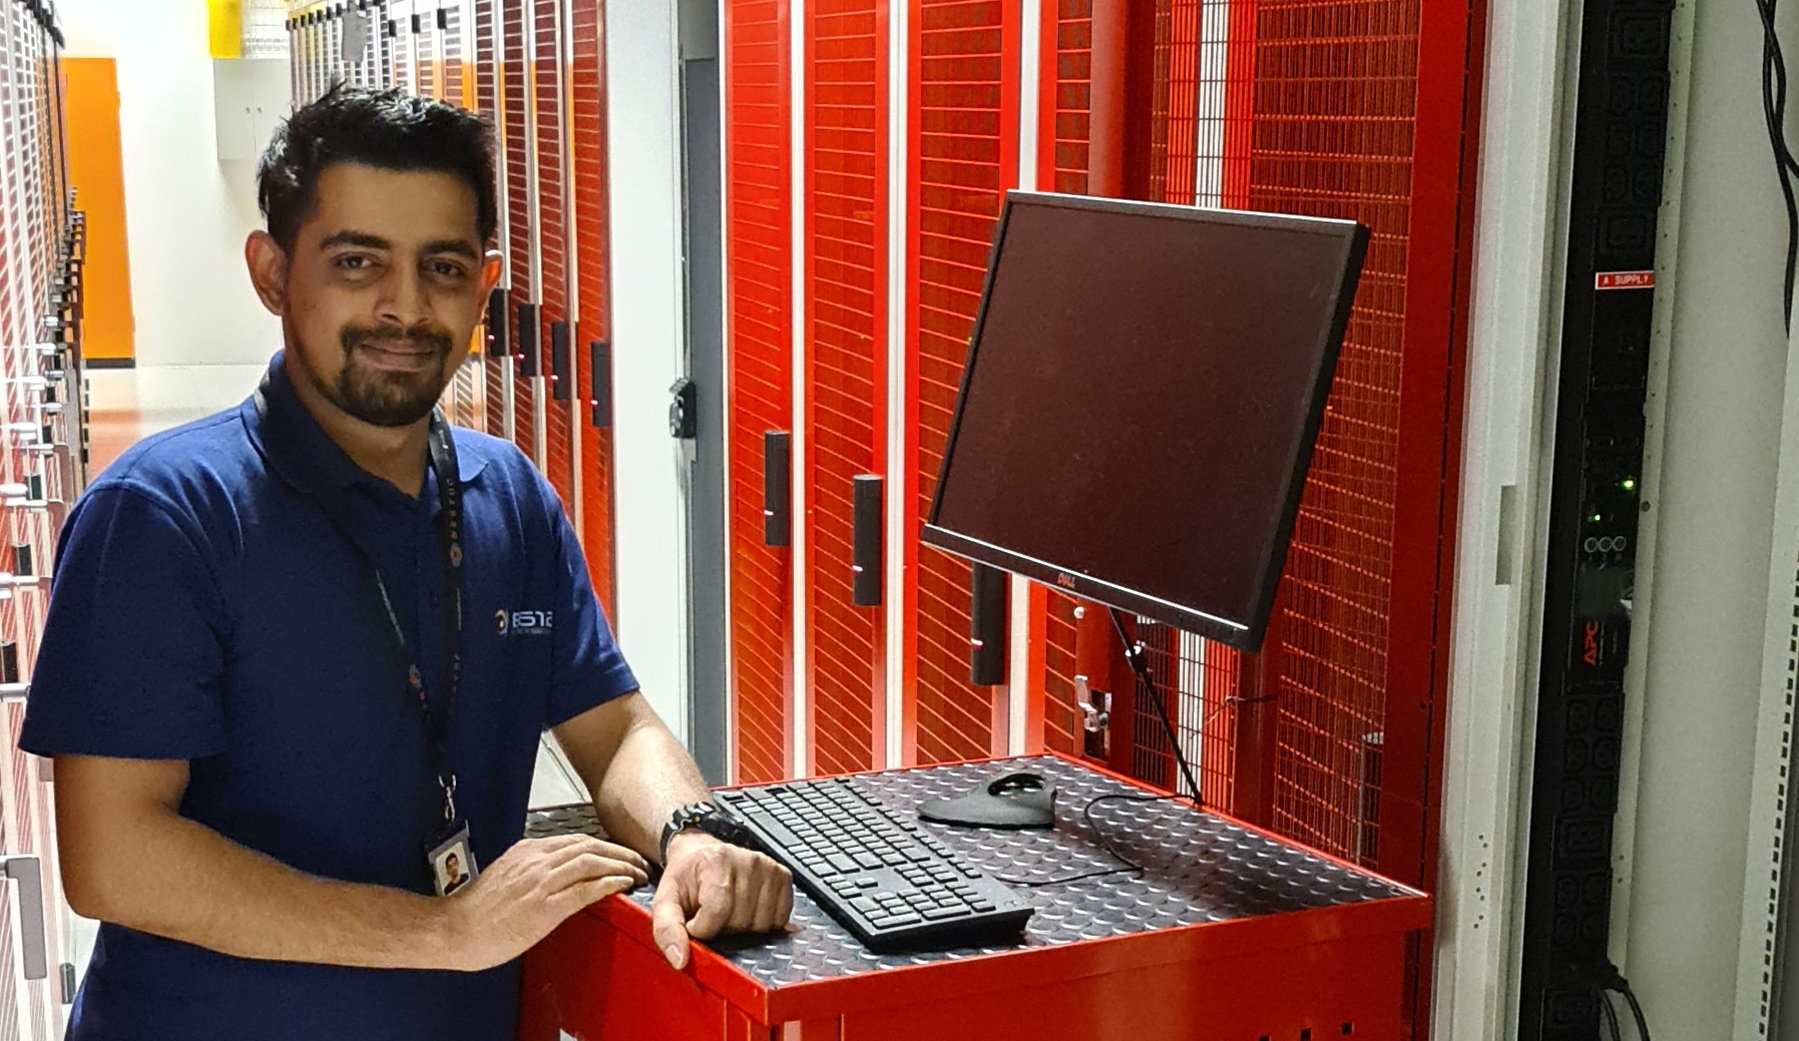 Wazeem, Senior Engineer - Melbourne